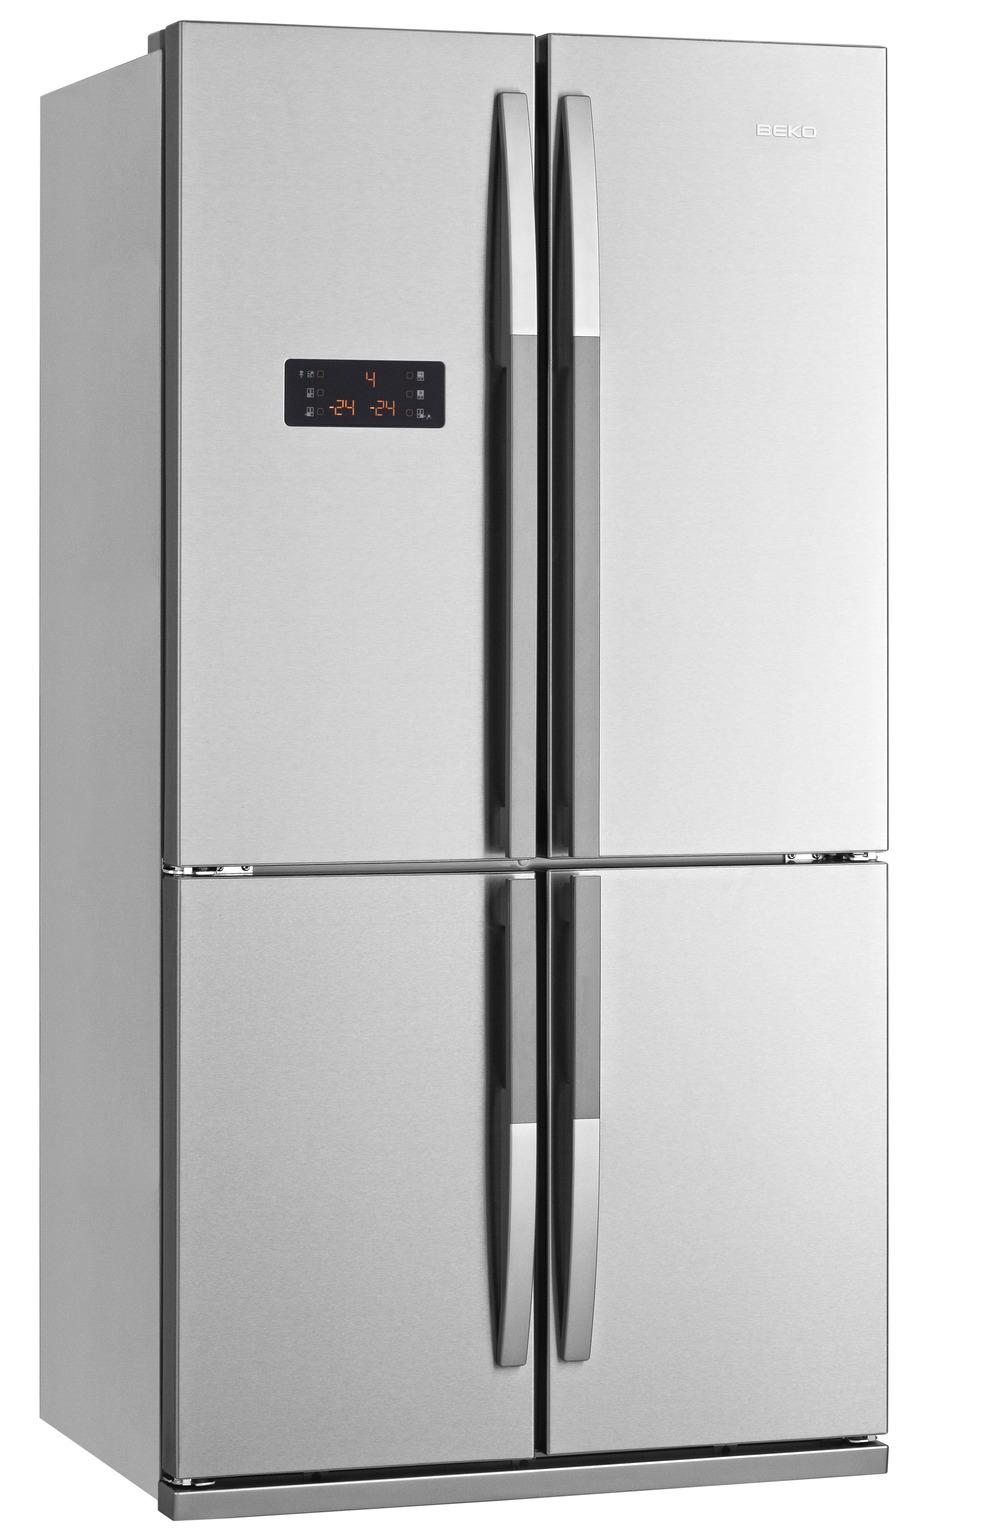 beko amerikaner køleskab